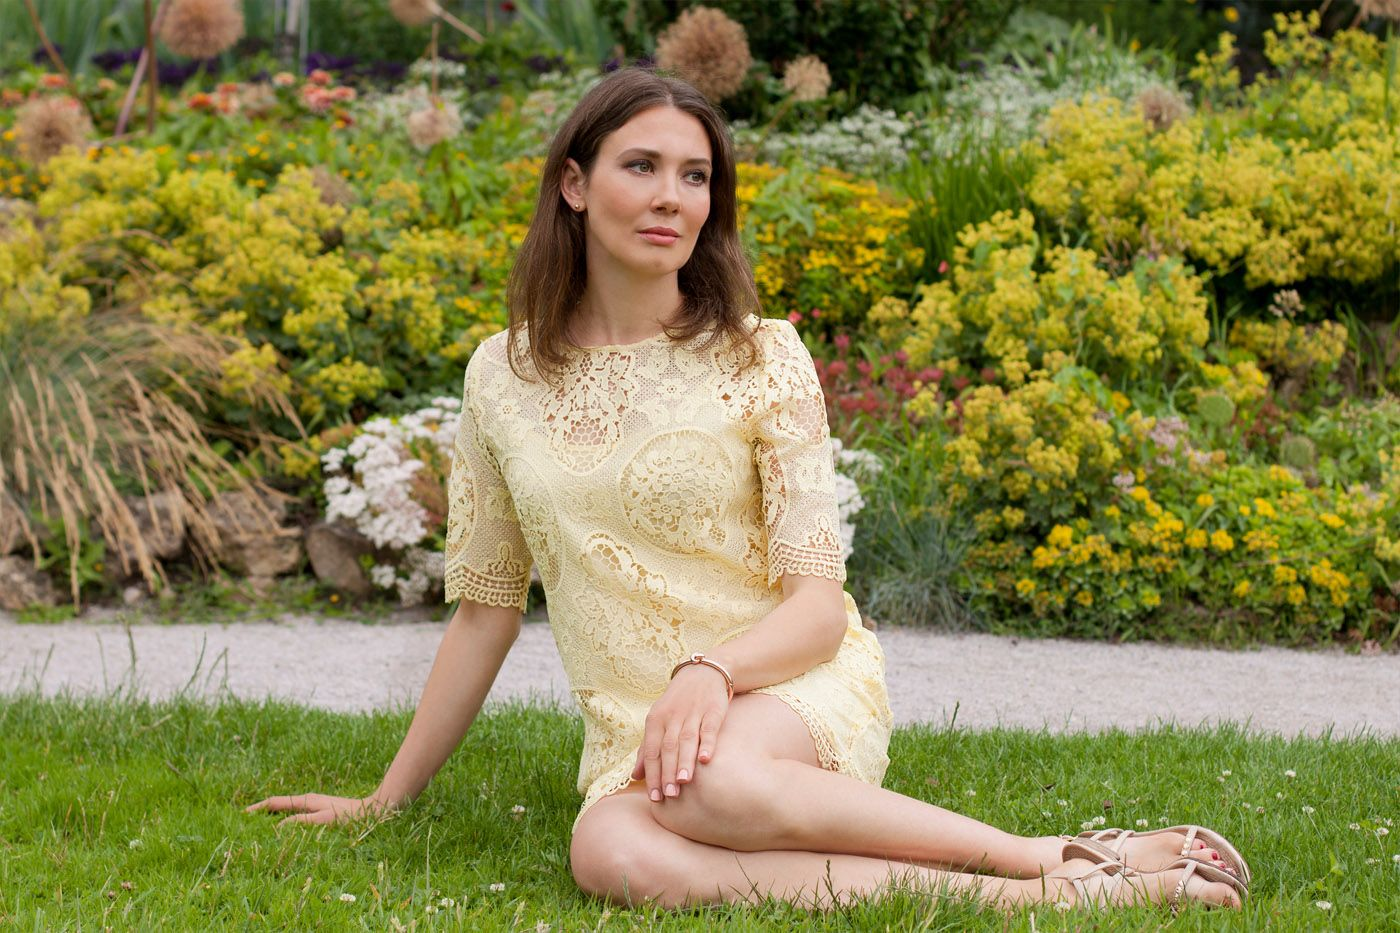 Vanilla Zara Dress - More to see on my blog: http://www.moodforstyle.de/outfit-vanilla-zara-dress/